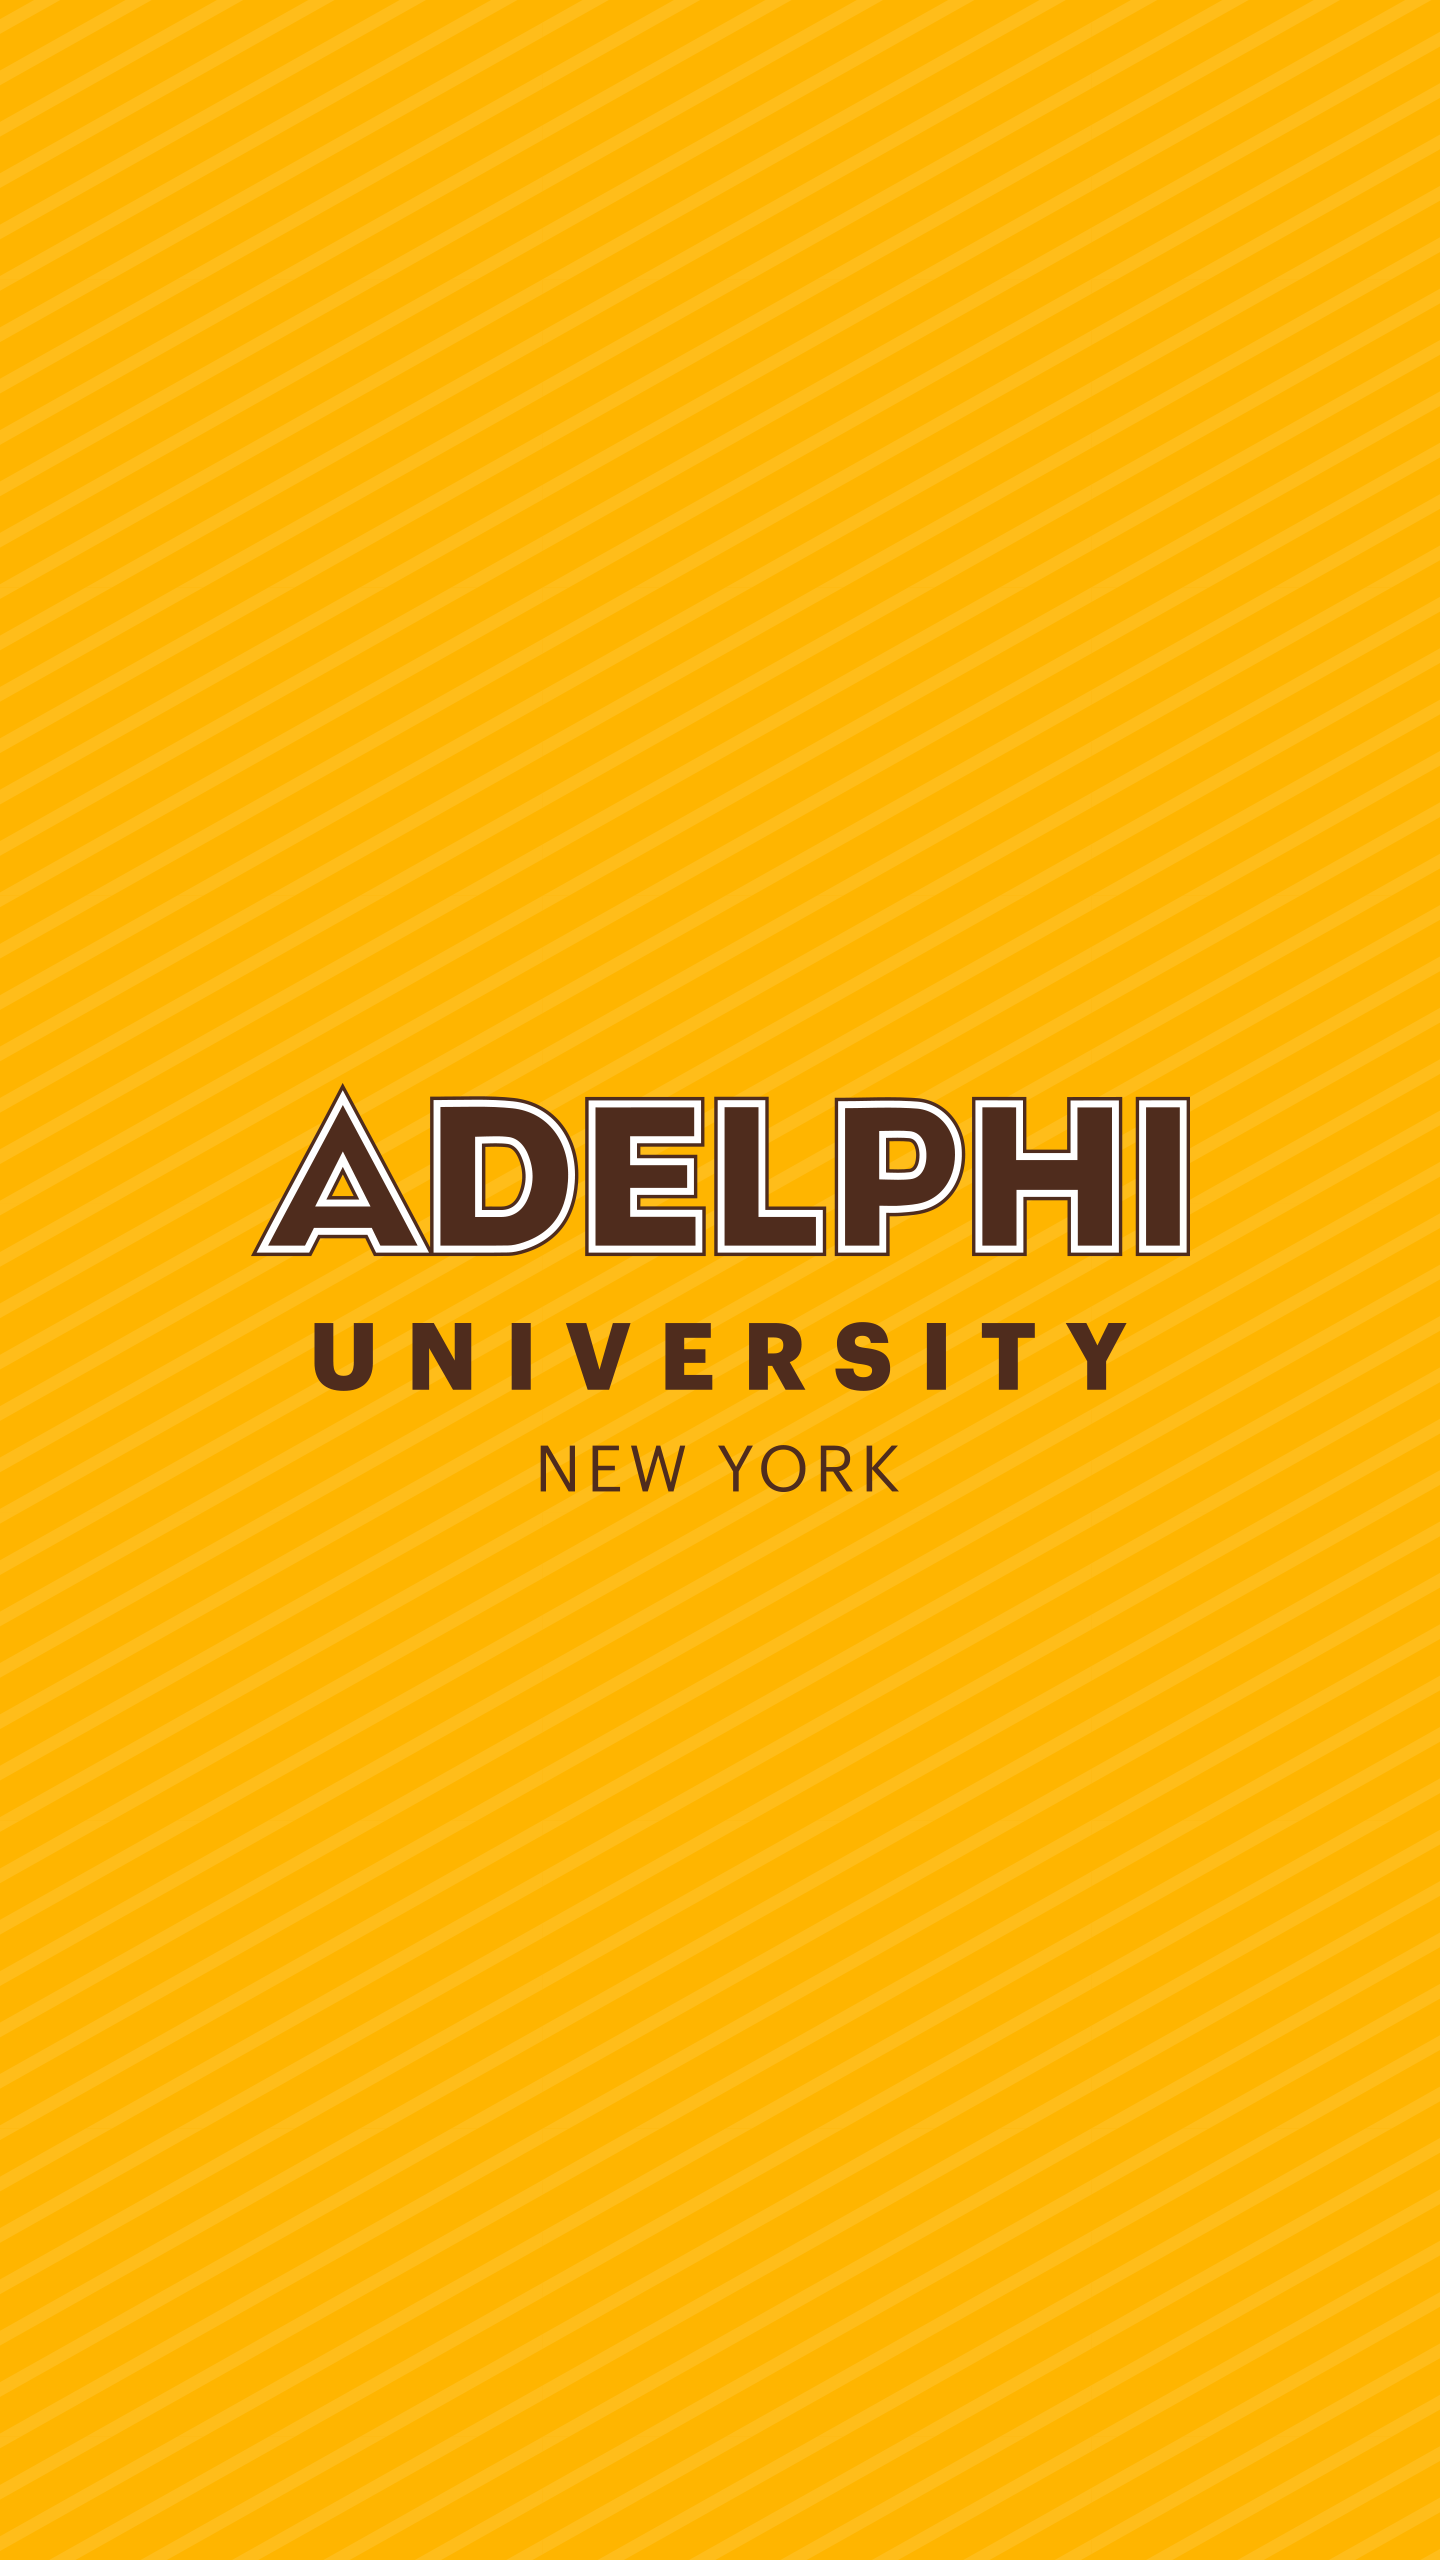 Smartphone - Adelphi Gold Wallpaper